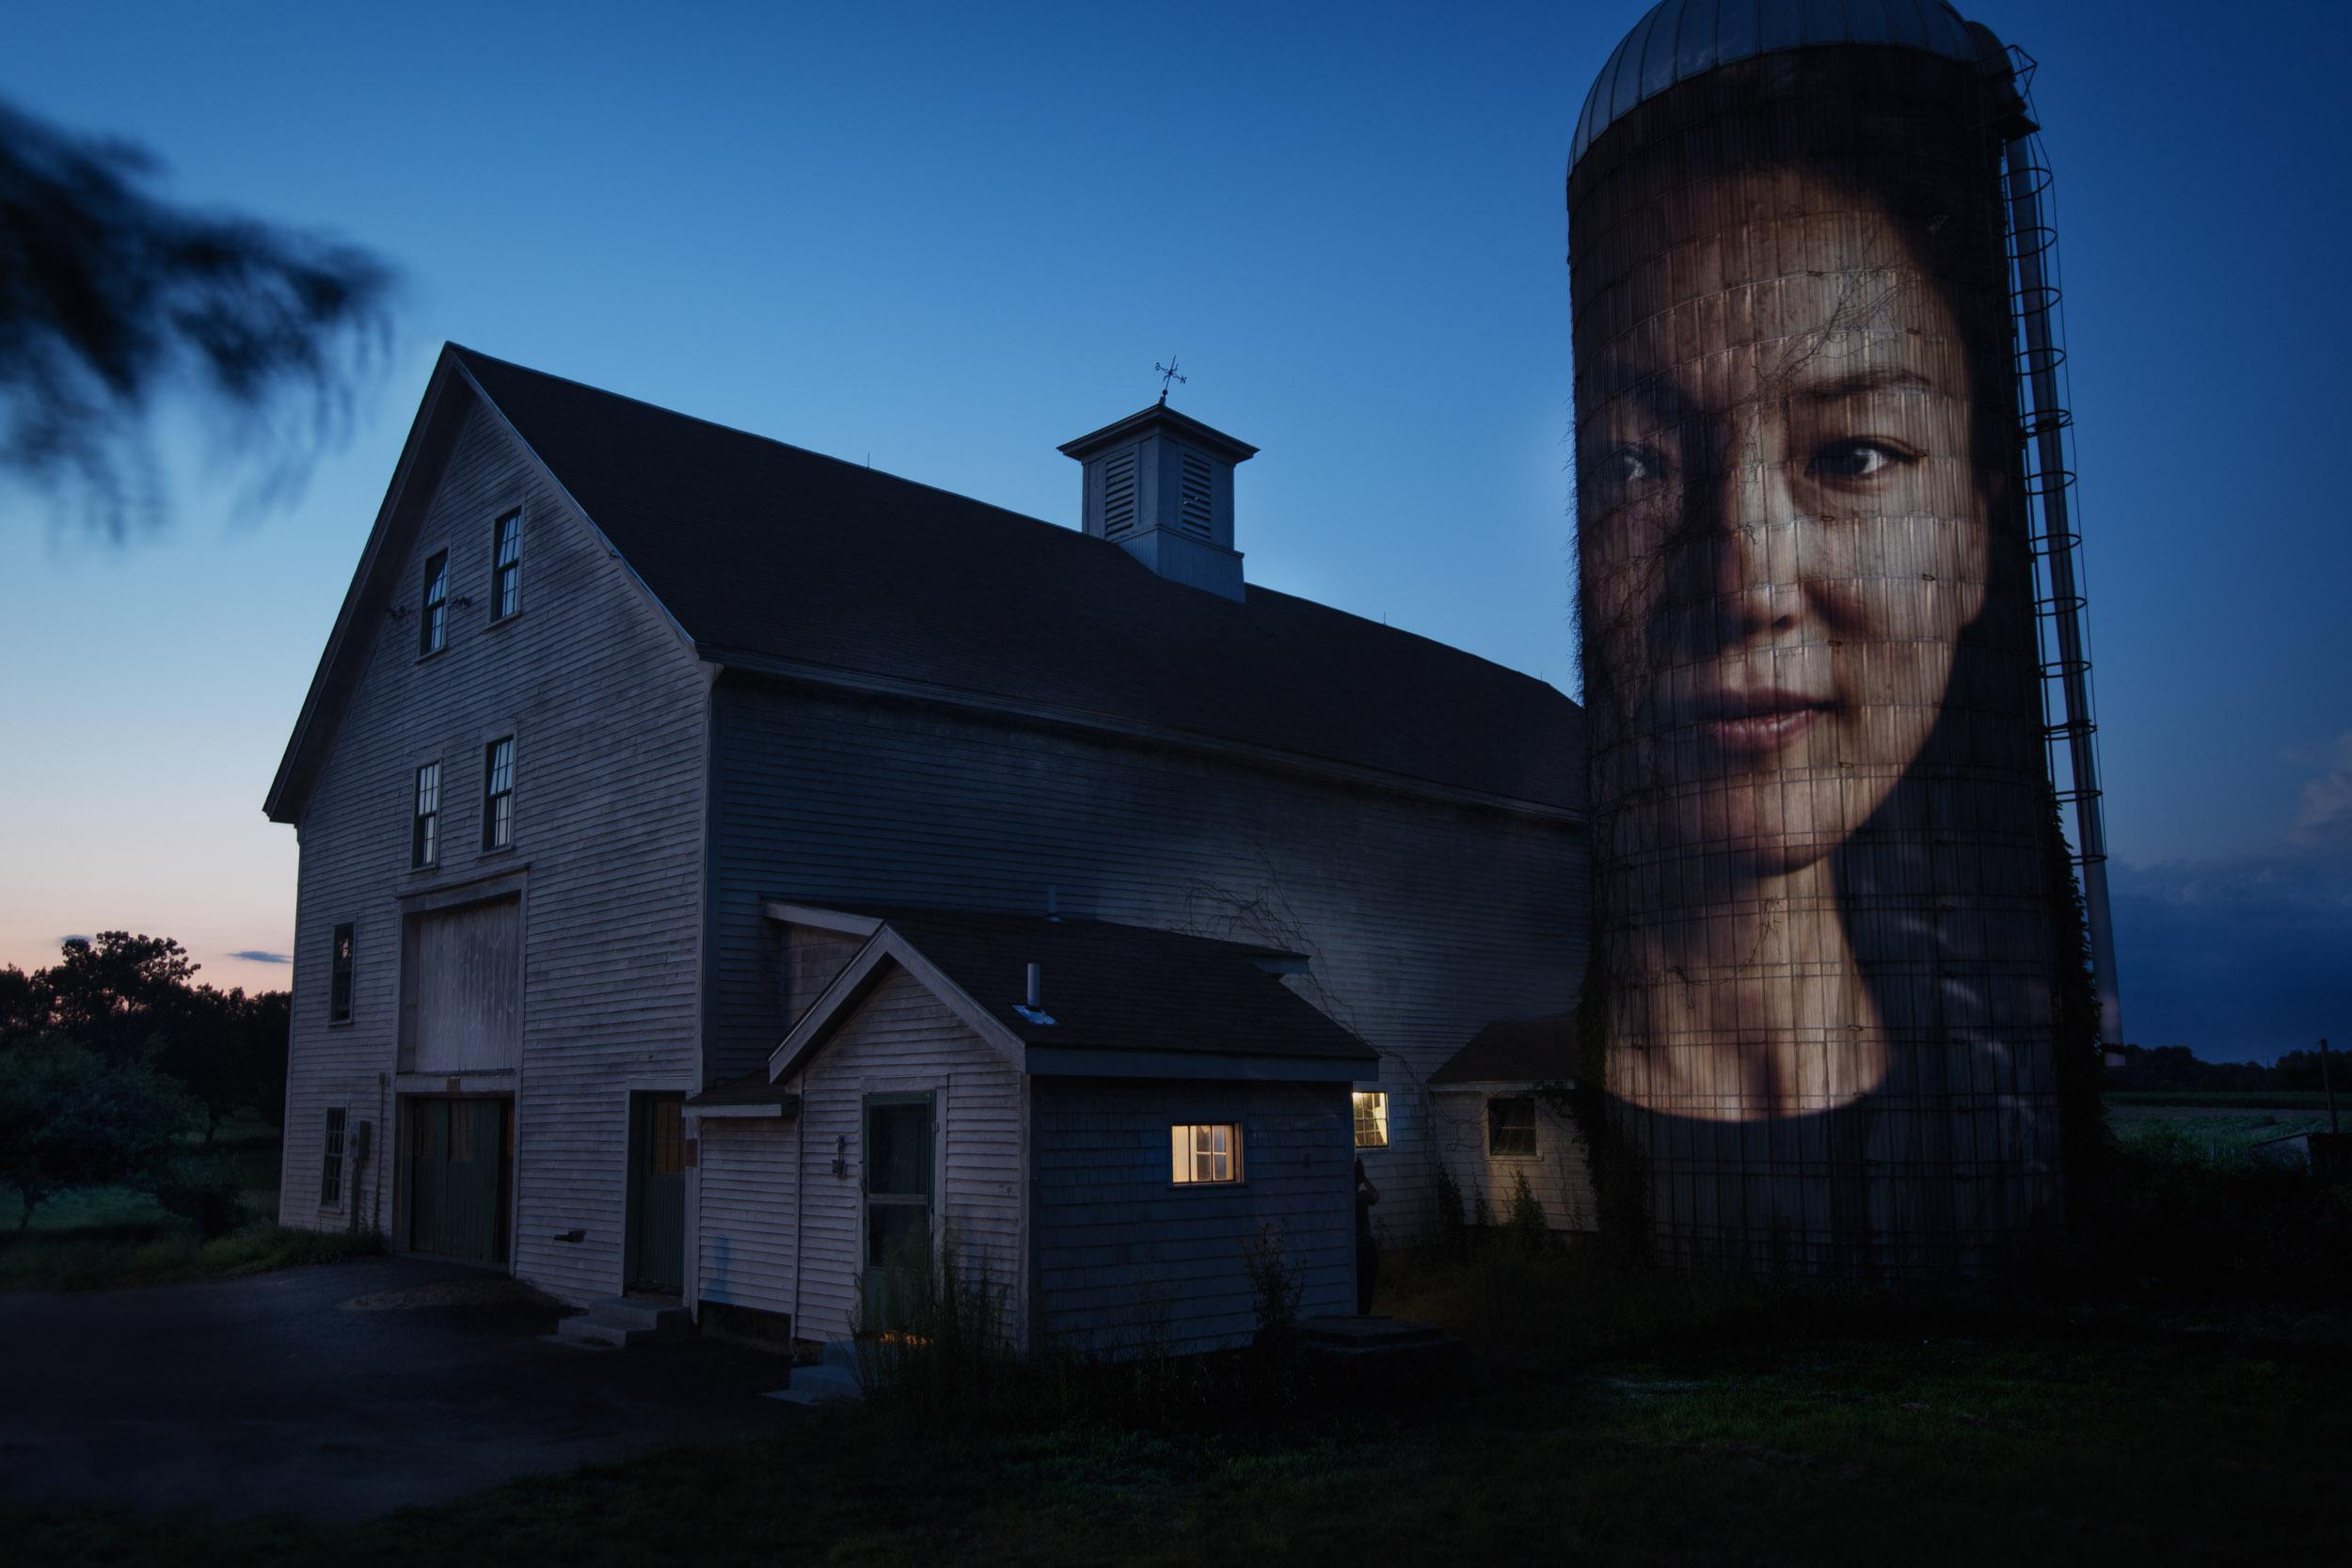 Jennifer Hyoje-Ryu Kenty | South Korea Farmer - Projected on a barn in Concord, MA